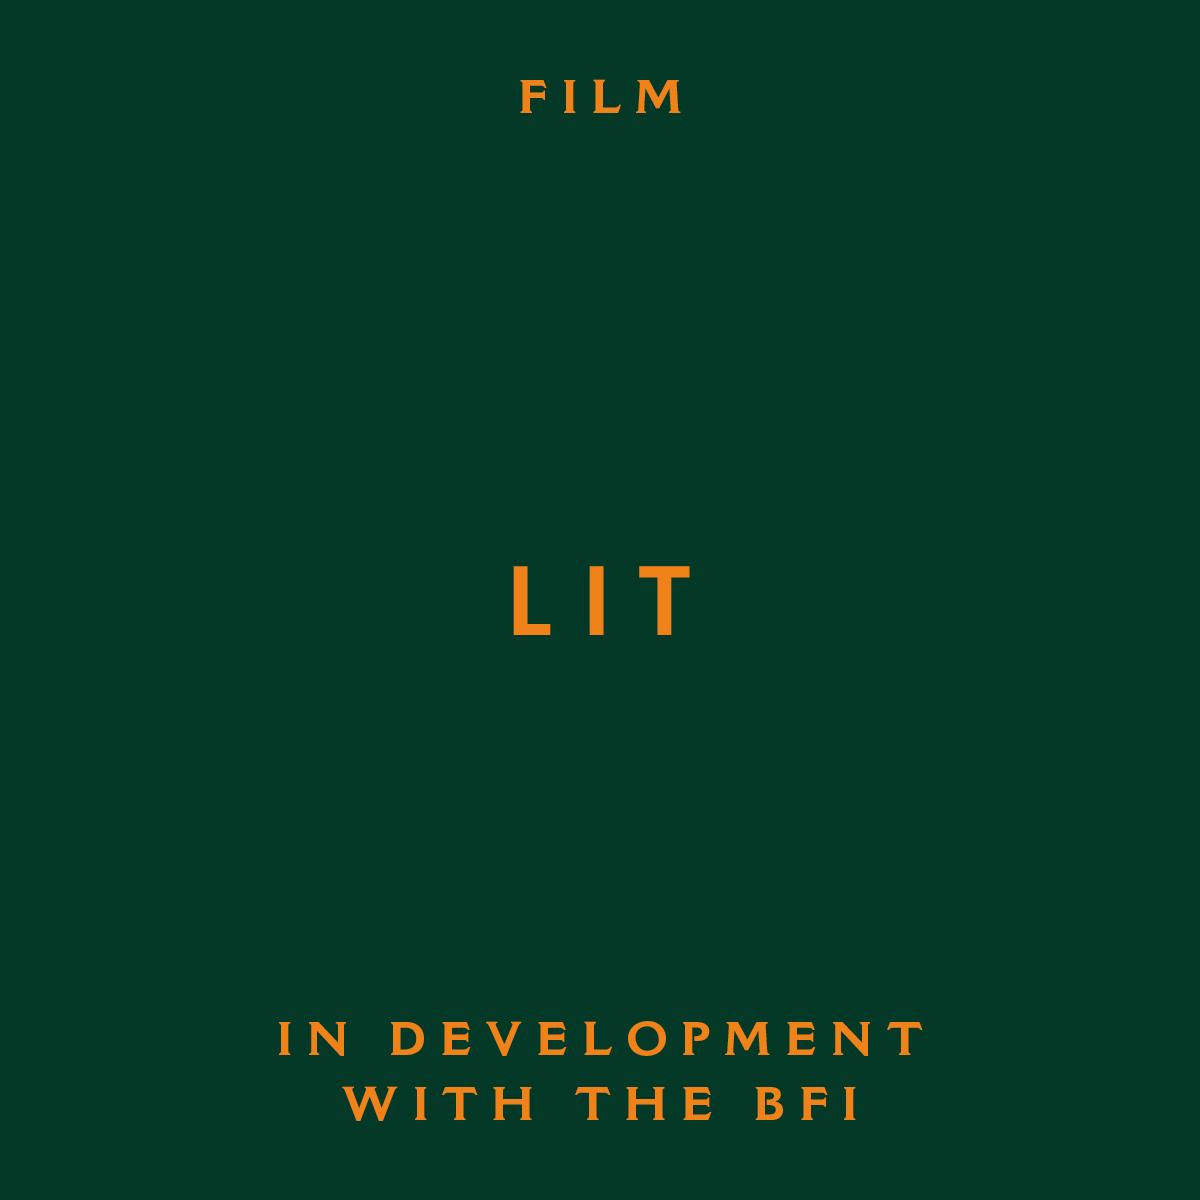 lit, in development, film, BFI